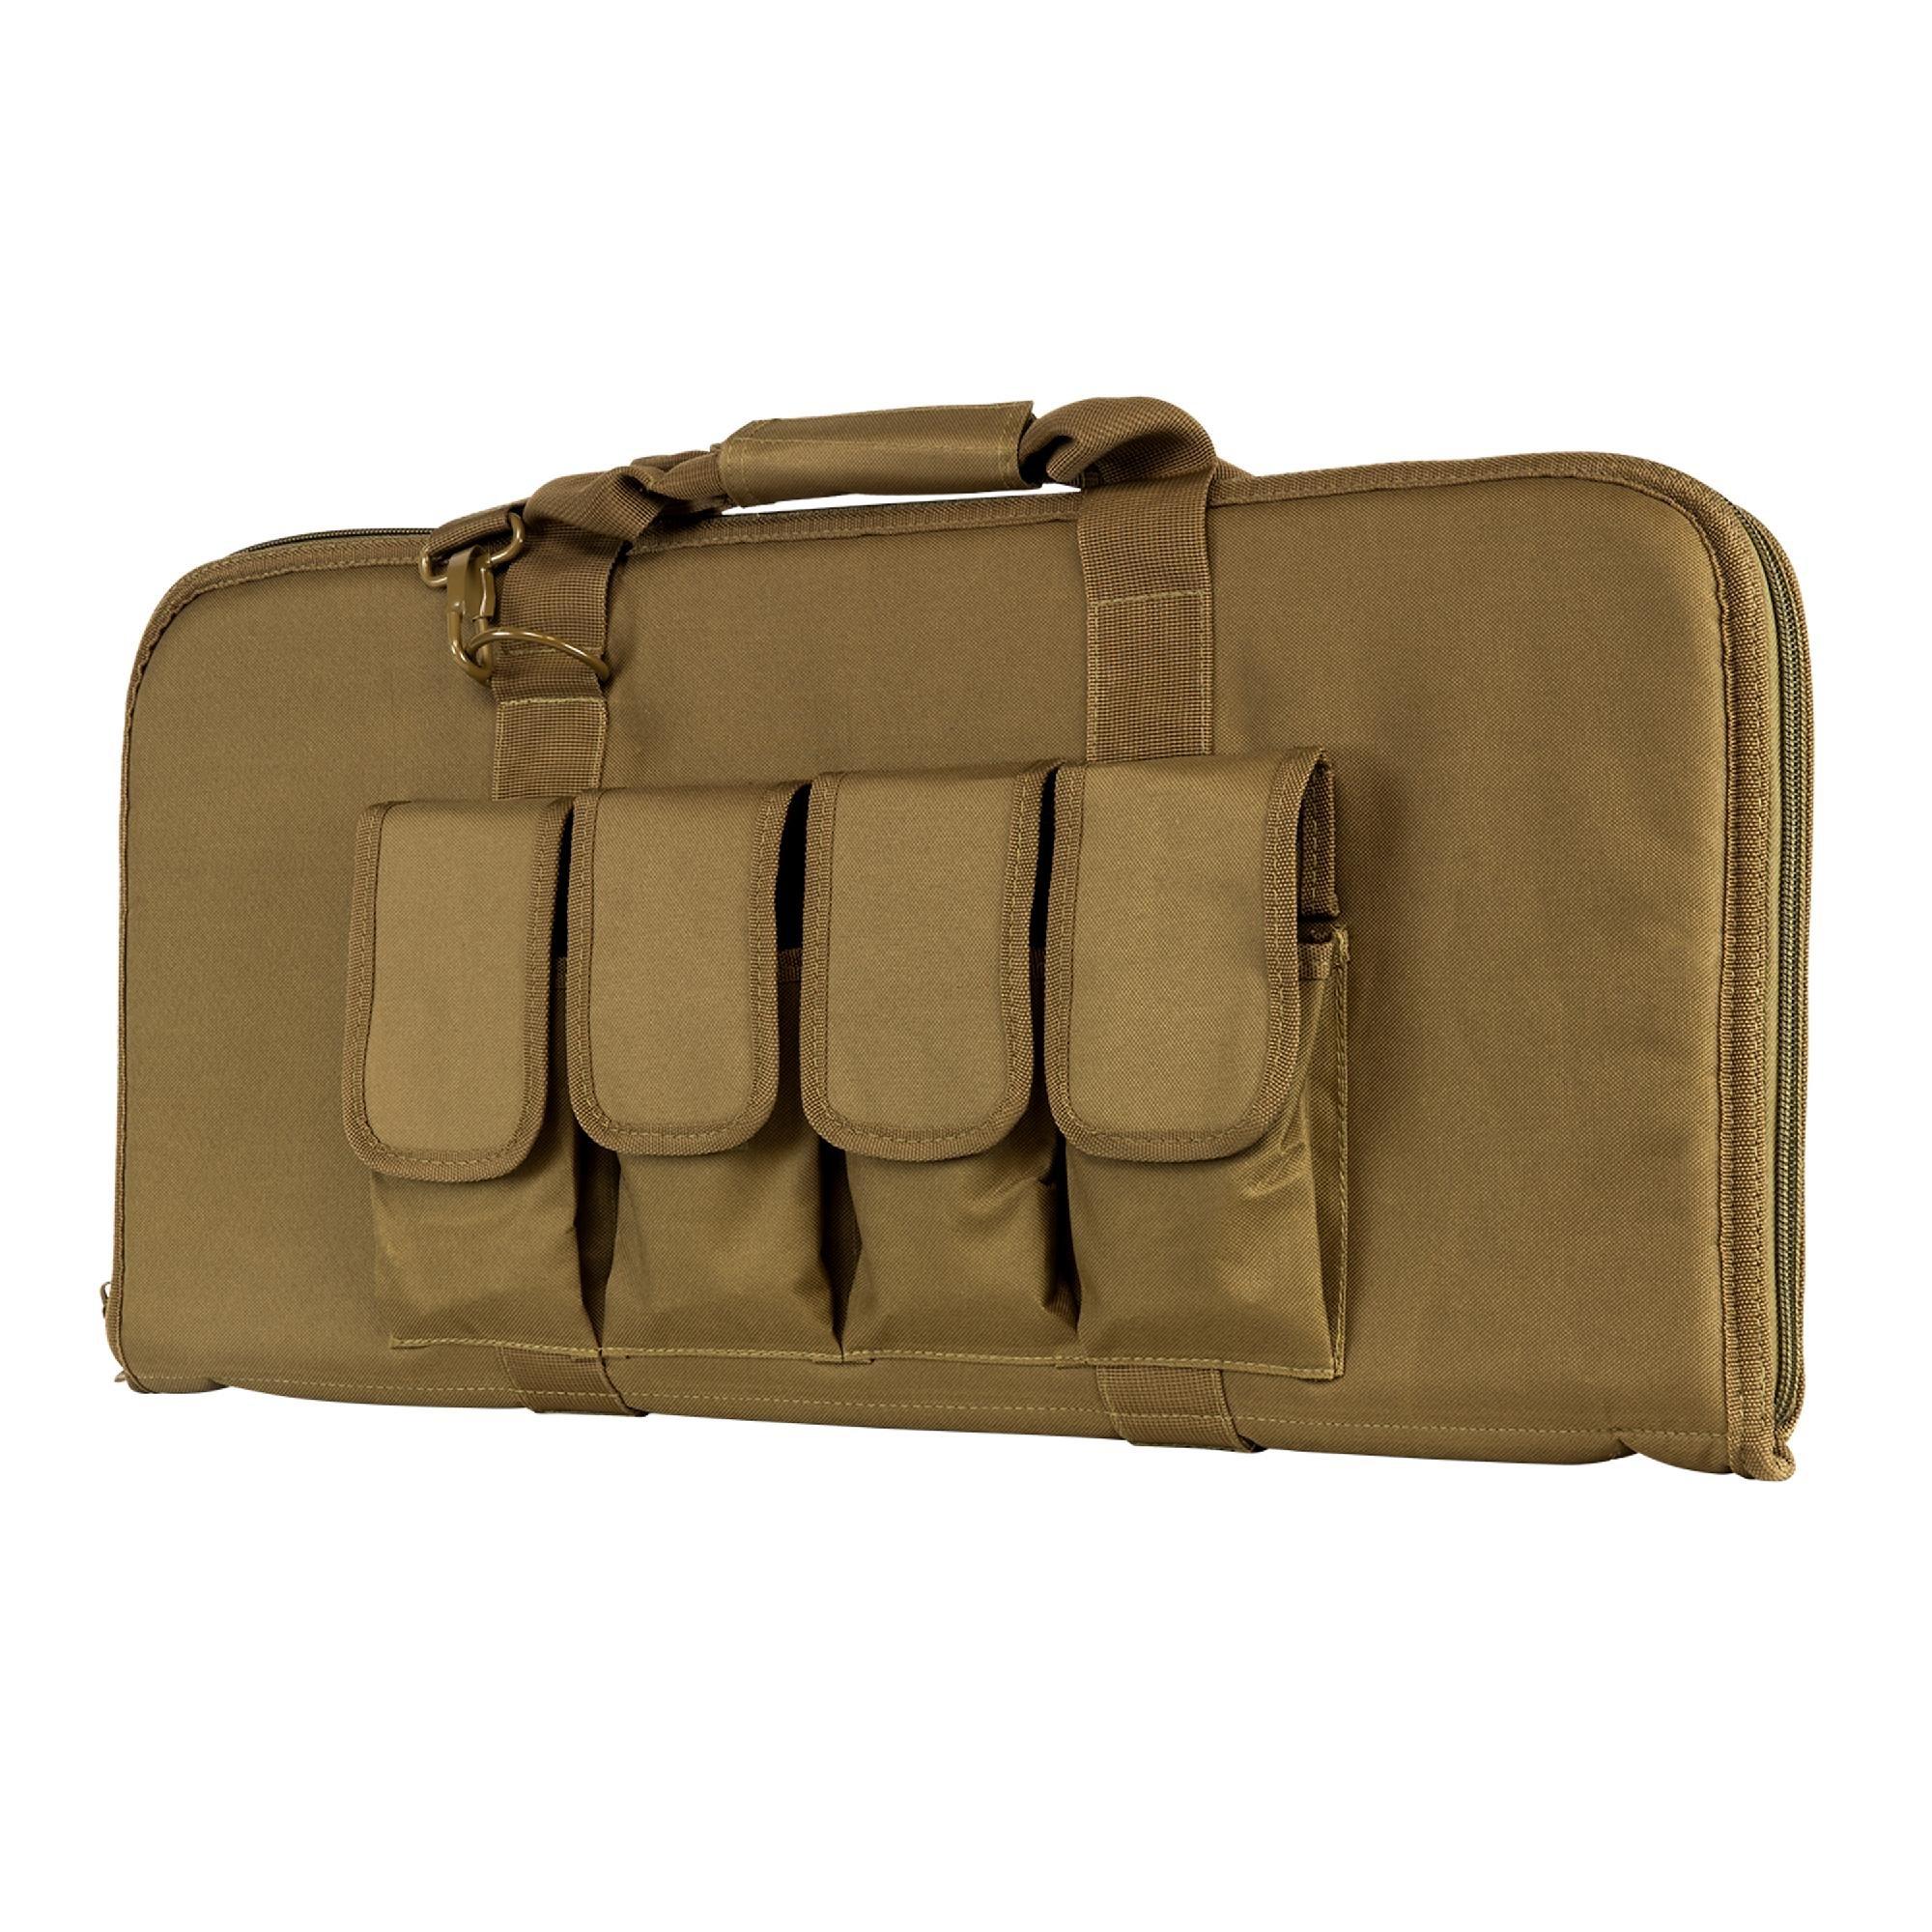 VISM by NcStar CVCP2960T-28 Pistol Subgun Gun Case, Tan, 28'' x 13''